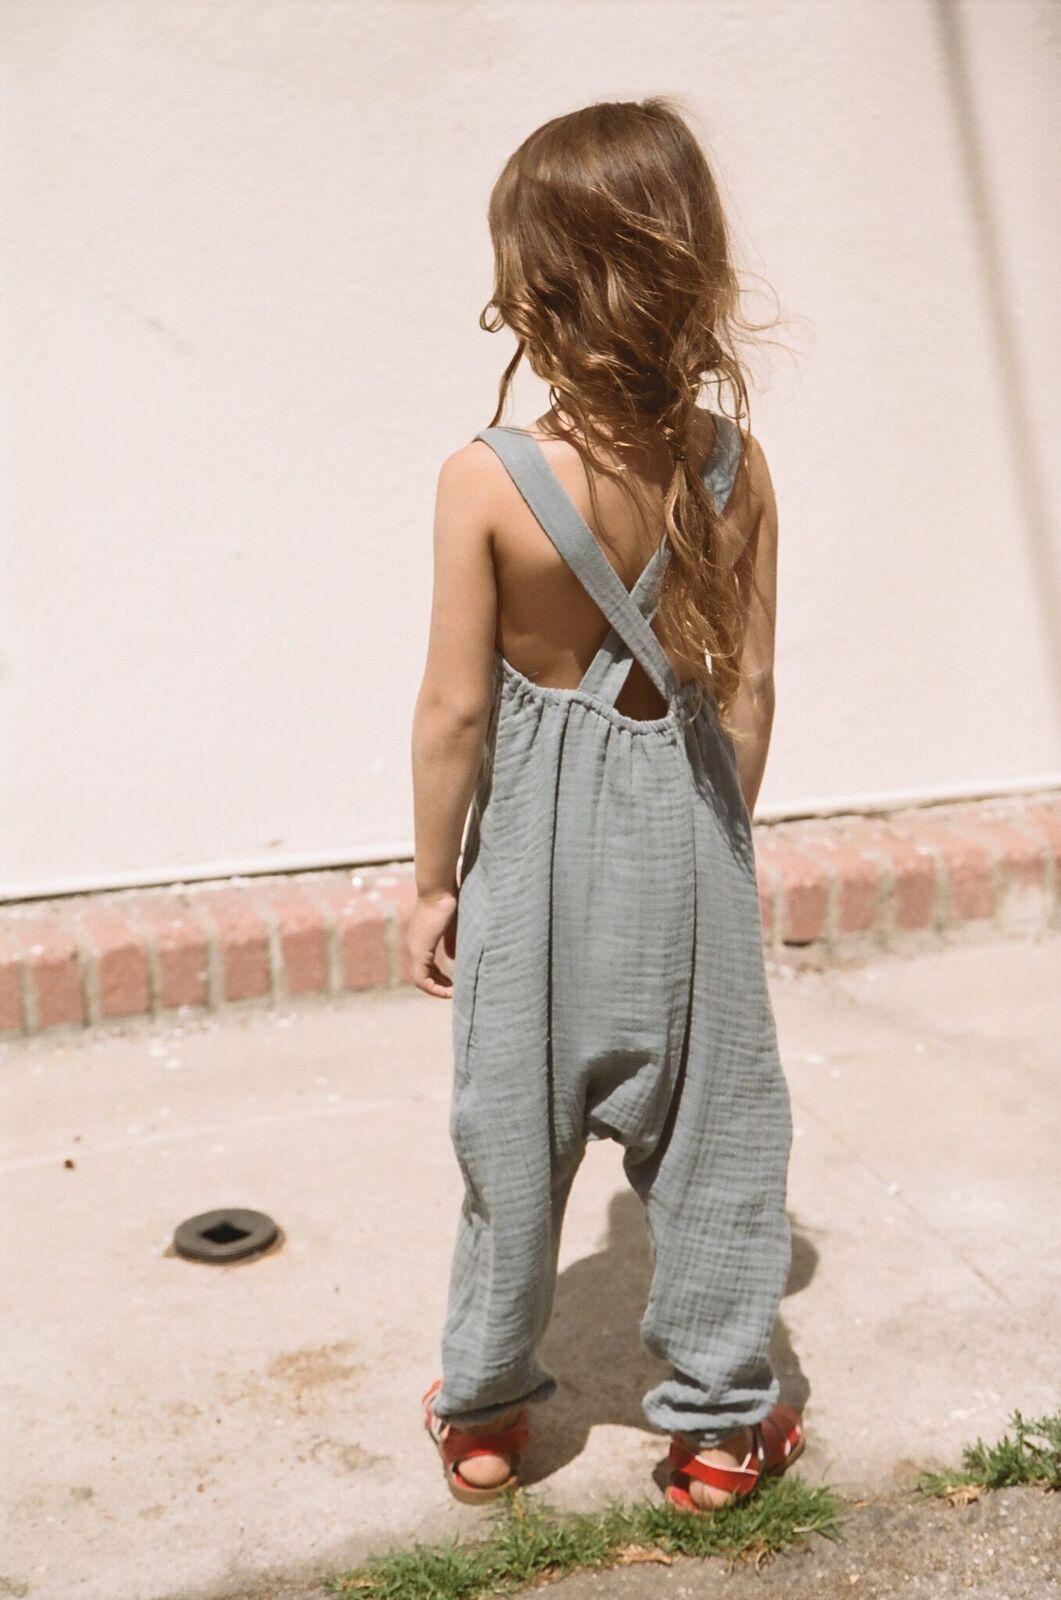 Coole schnittmuster kleider